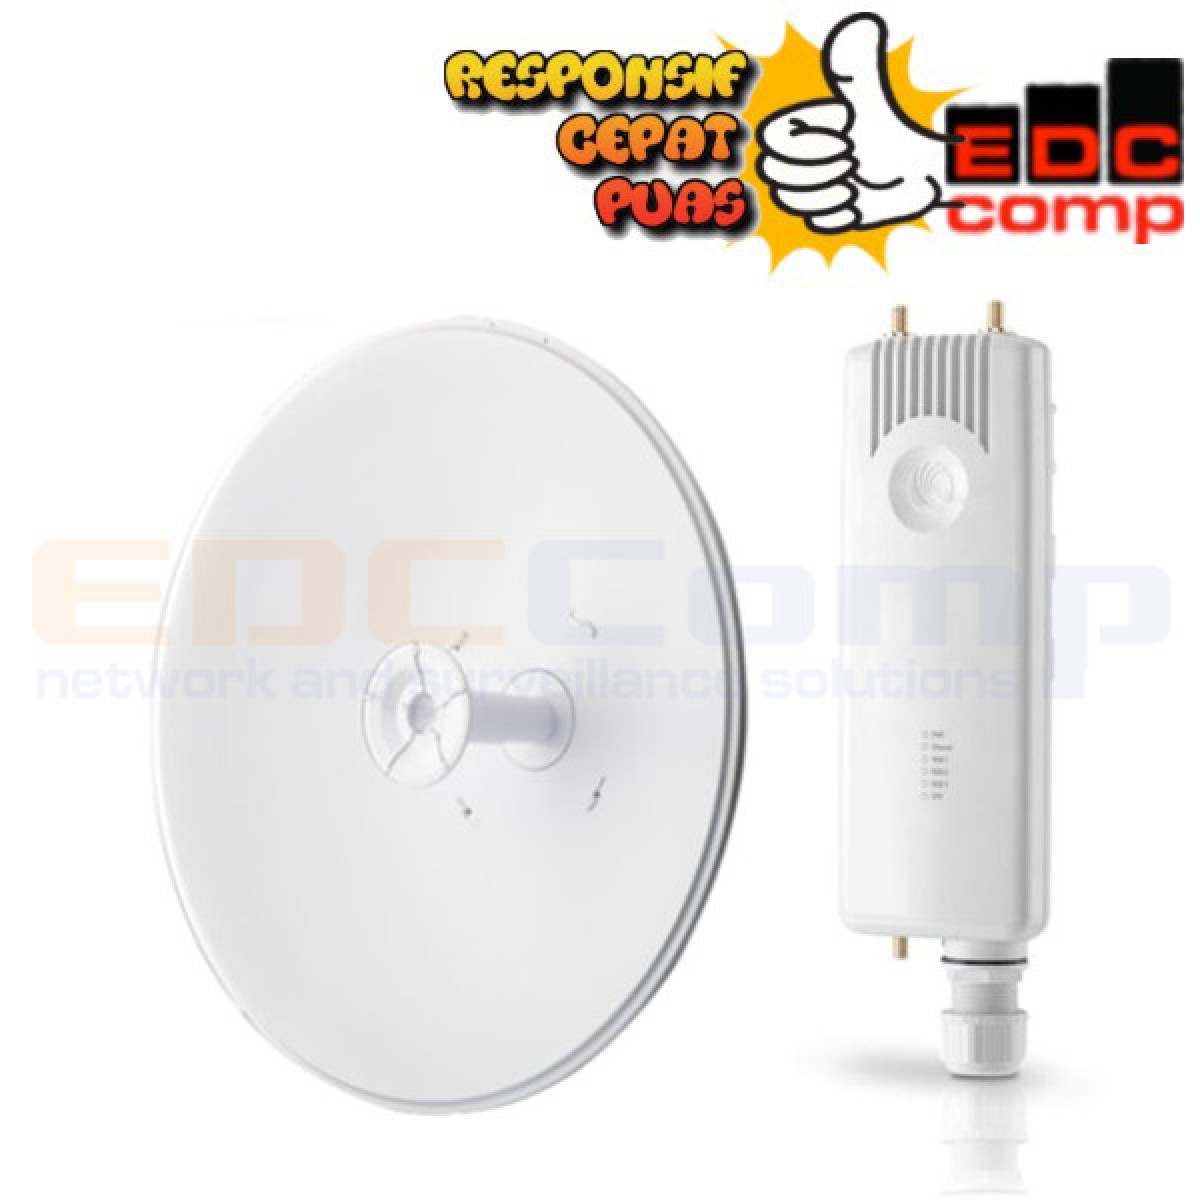 Cambium Networks ePMP Force 300 + UBNT Rocket Dish 5G 30dbi LW - EdcComp